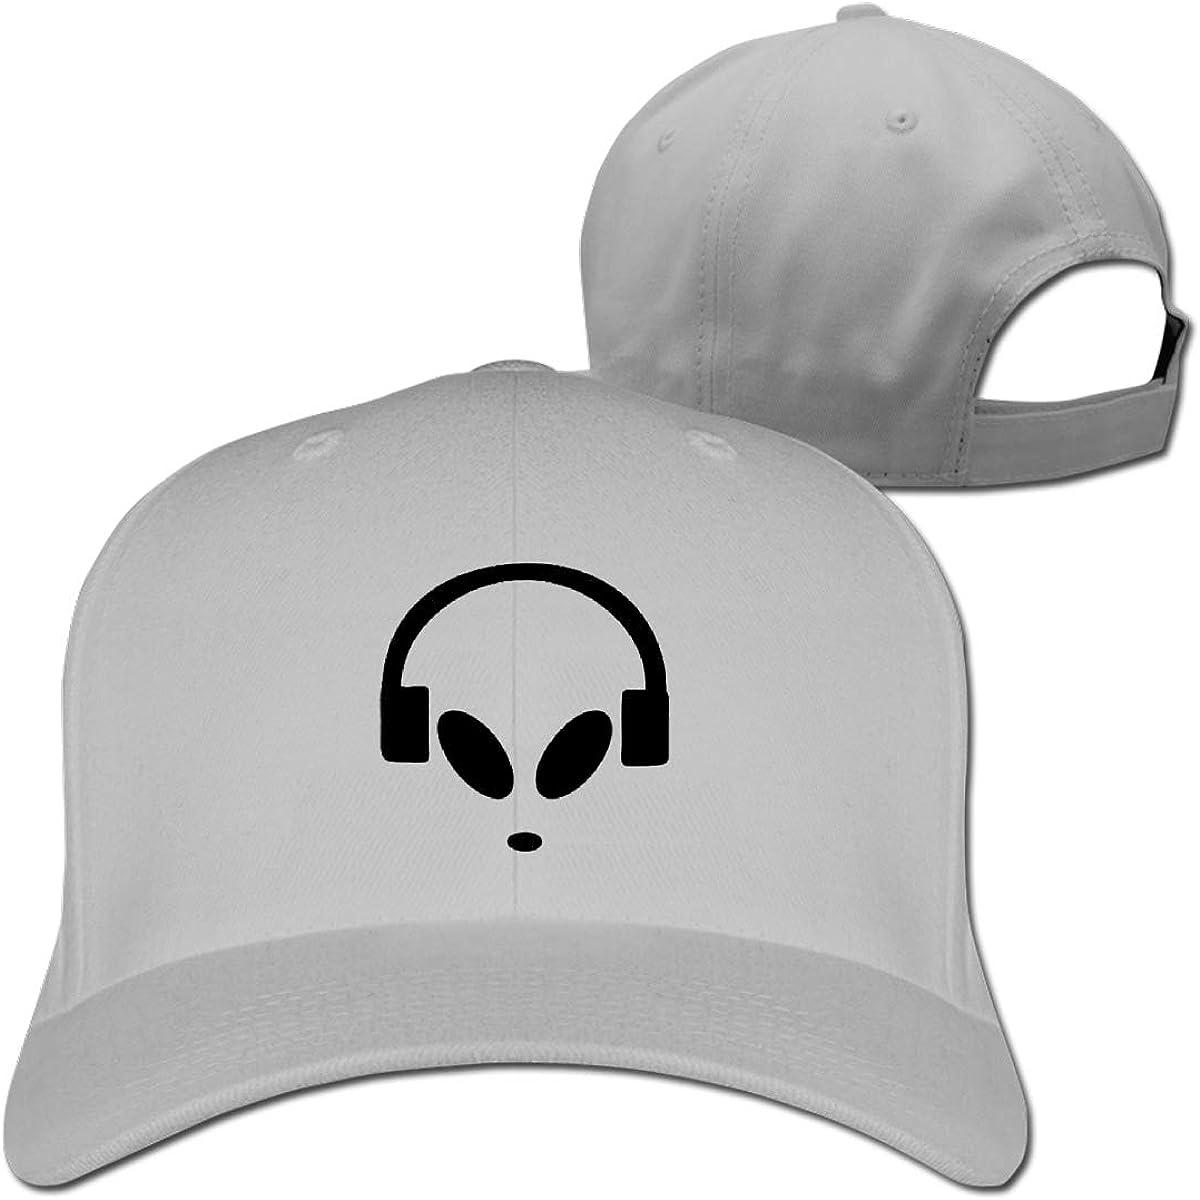 Alien DJ Fashion Adjustable Cotton Baseball Caps Trucker Driver Hat Outdoor Cap Gray